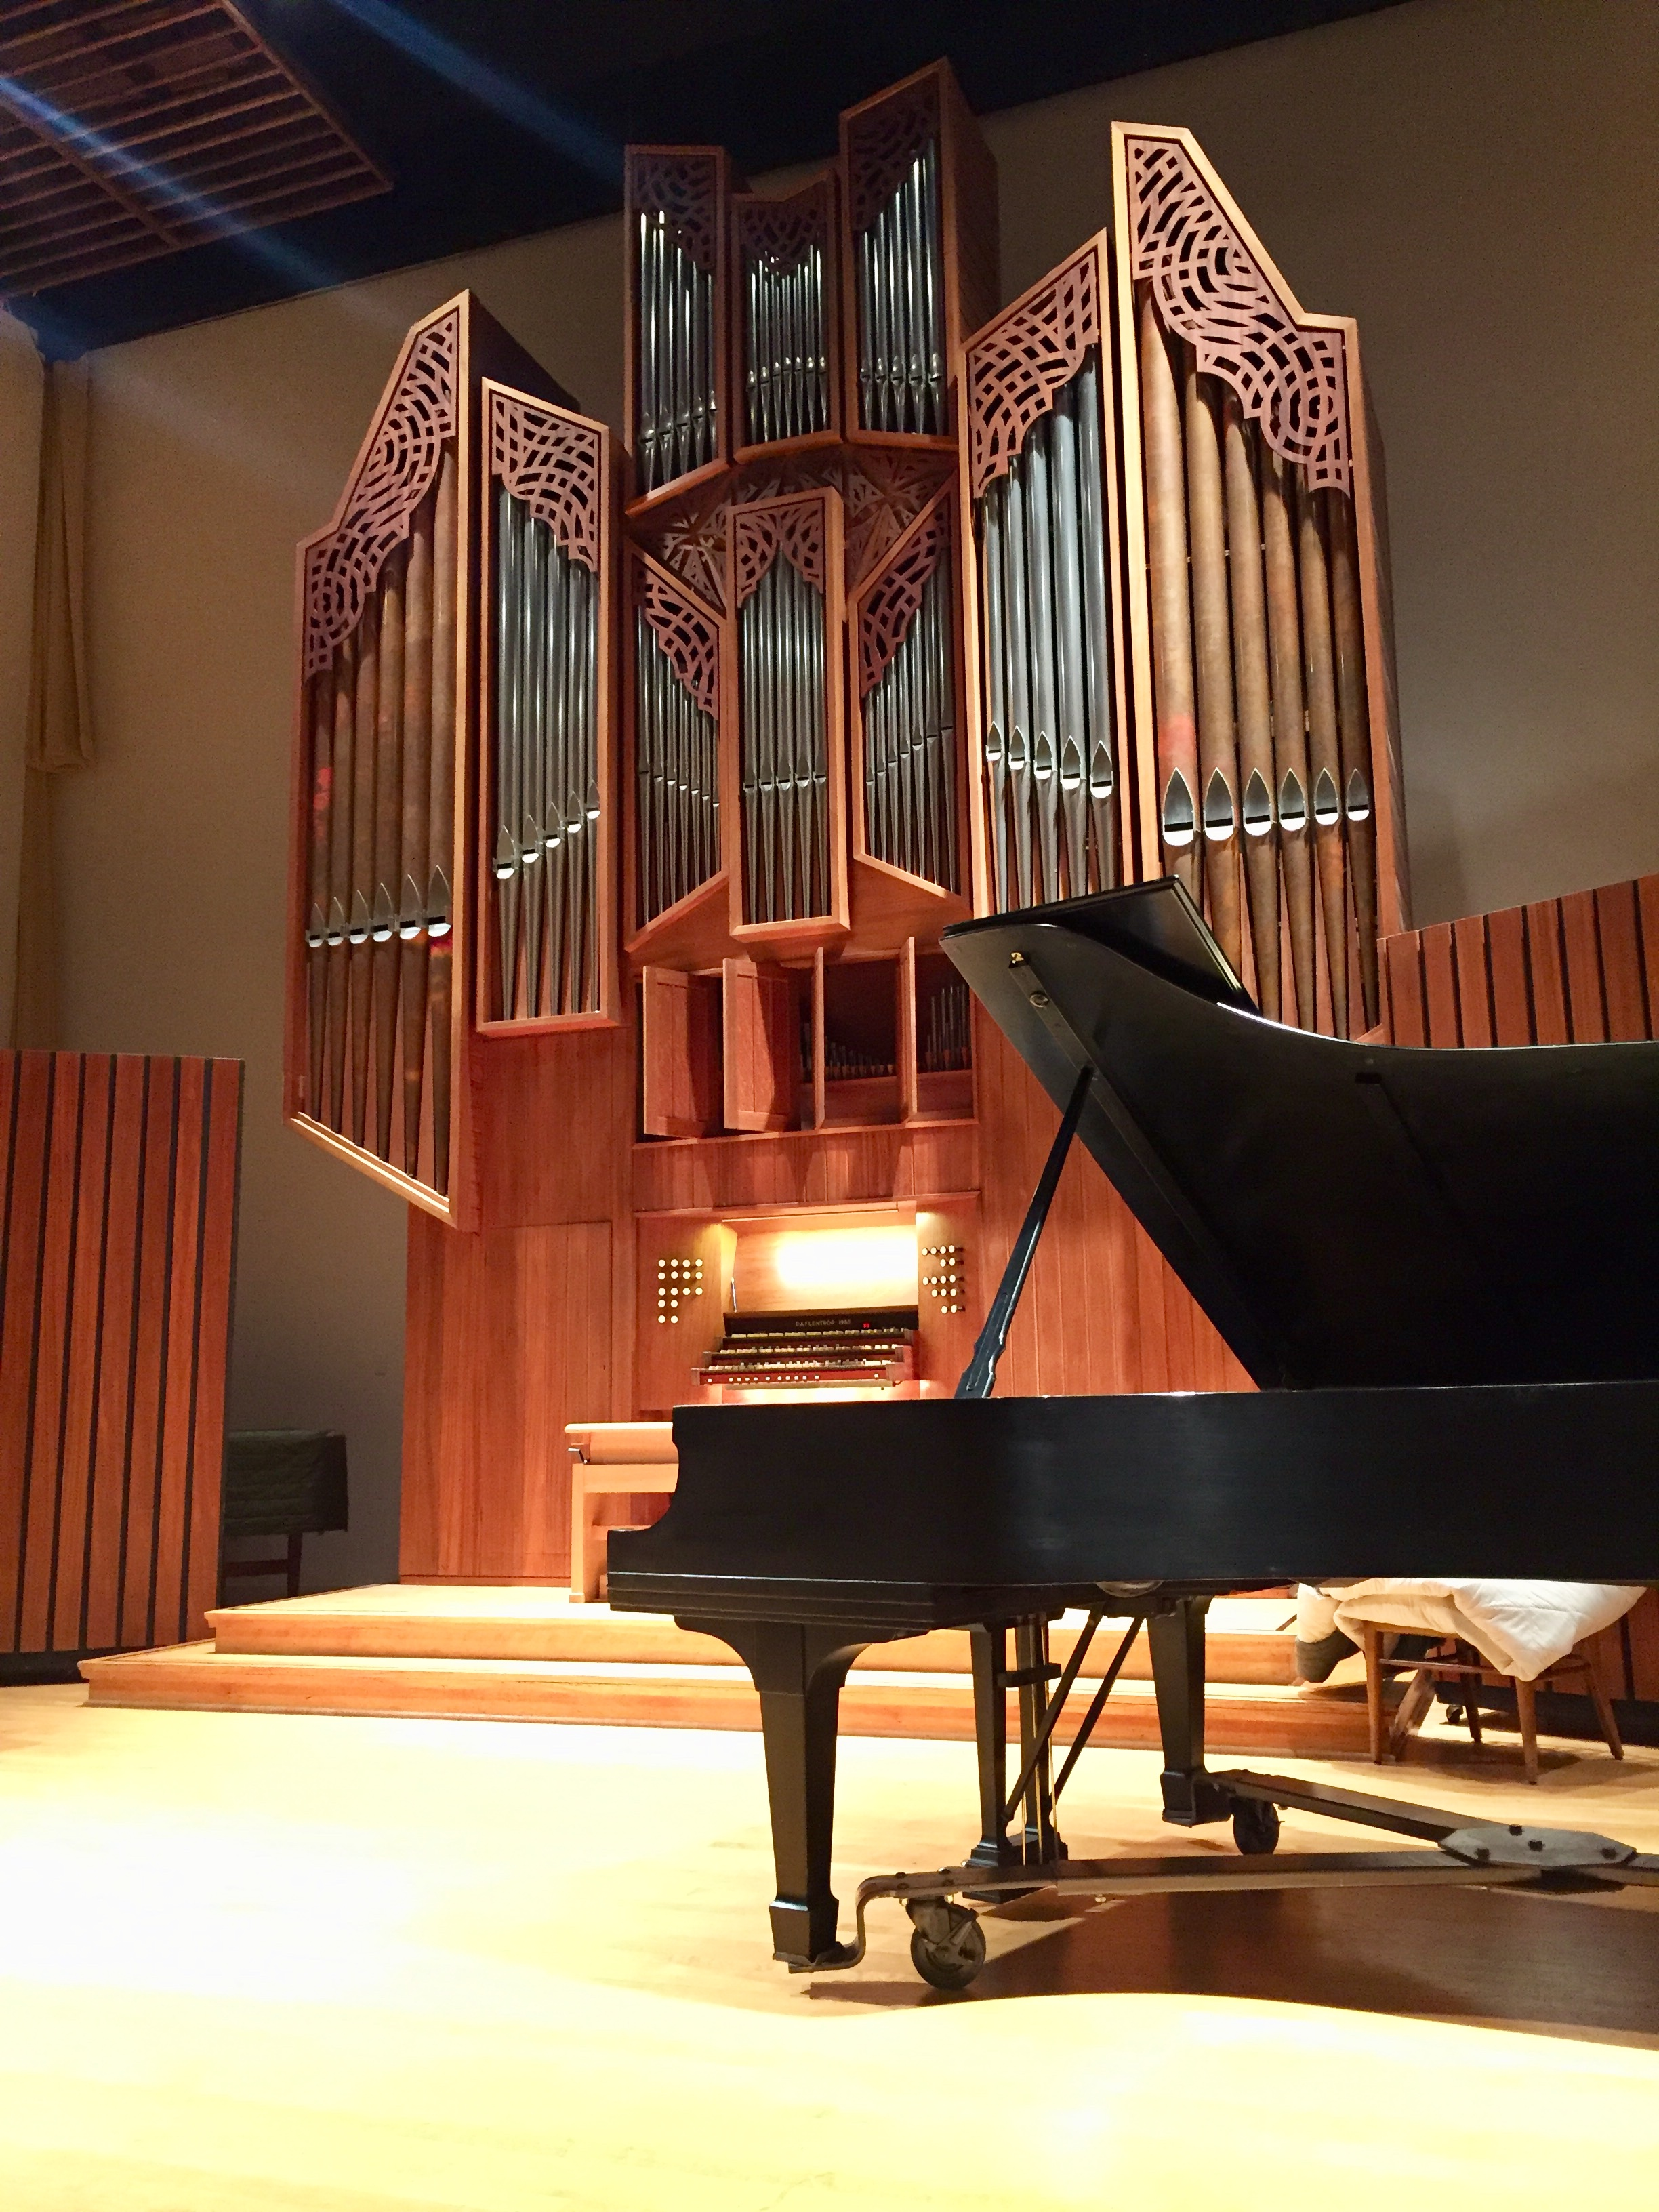 Flentrop Organ behind a Steinway Grand Piano